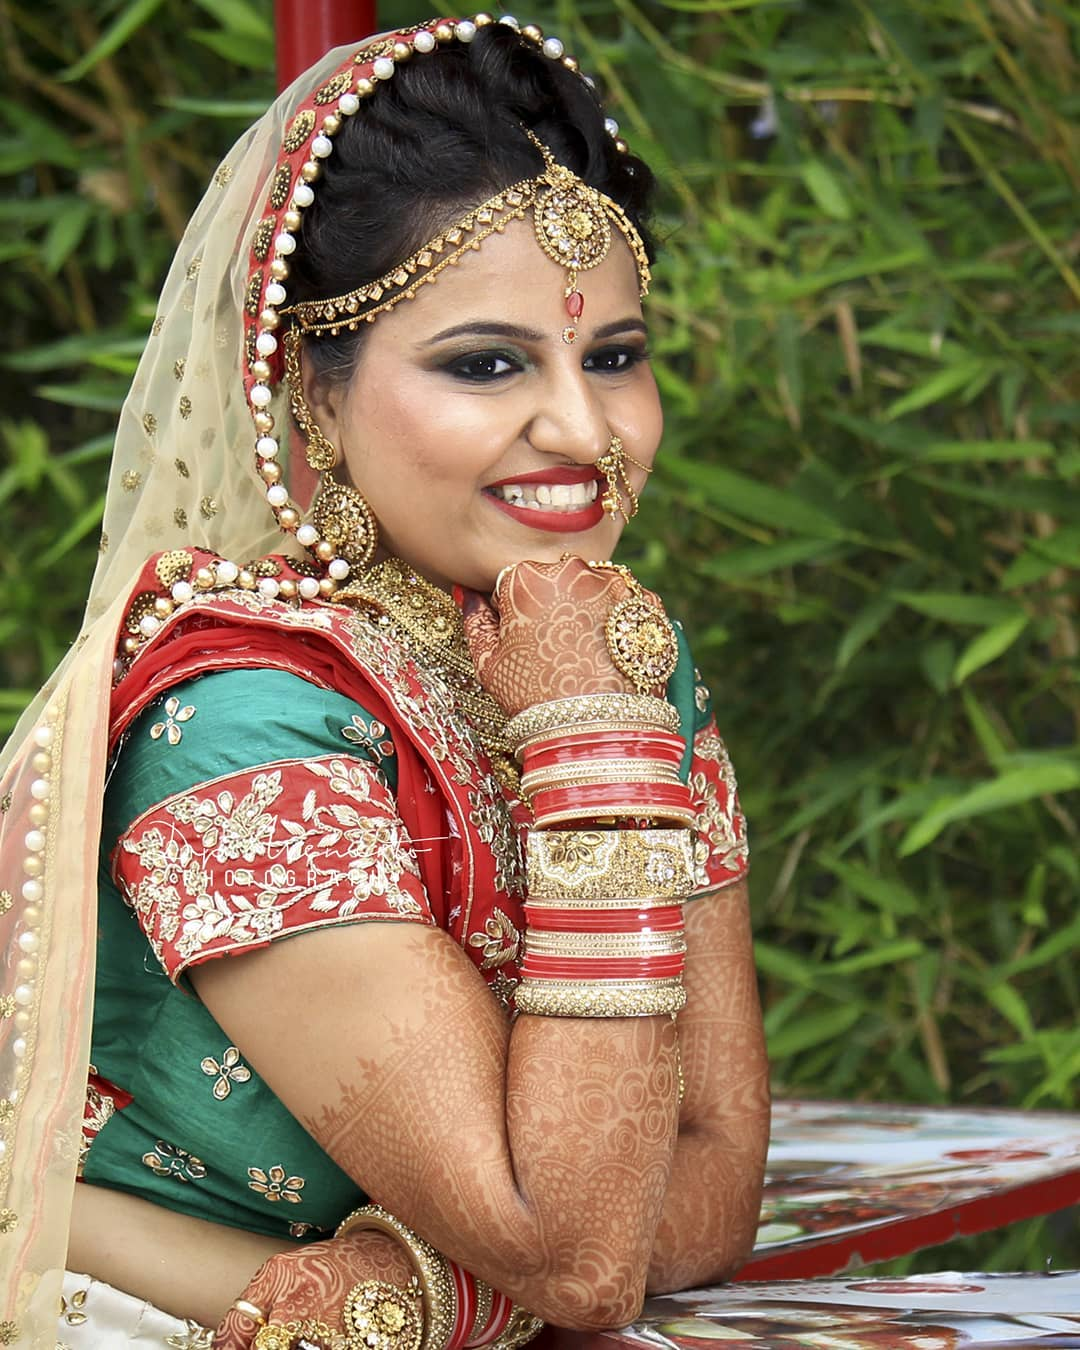 Dip Memento Photography,  dipmementophotography@dip_memento_photography, india#indian#photo#photography#photographer#pic#storiesofindia#candidshoot#indianphotography#indianphotographers#canvasofindia#weddingportrait#streetphotographyindia#ahmedabad#oph#official_photographers_hub#indianshutterbugs#indiaclicks#_coi#india_everyday#i_hobbygraphy#igersoftheday#ahmedabad_diaries#dslr_official#weddingphotographer#indianphotography#photographers_of_india#destinationwedding